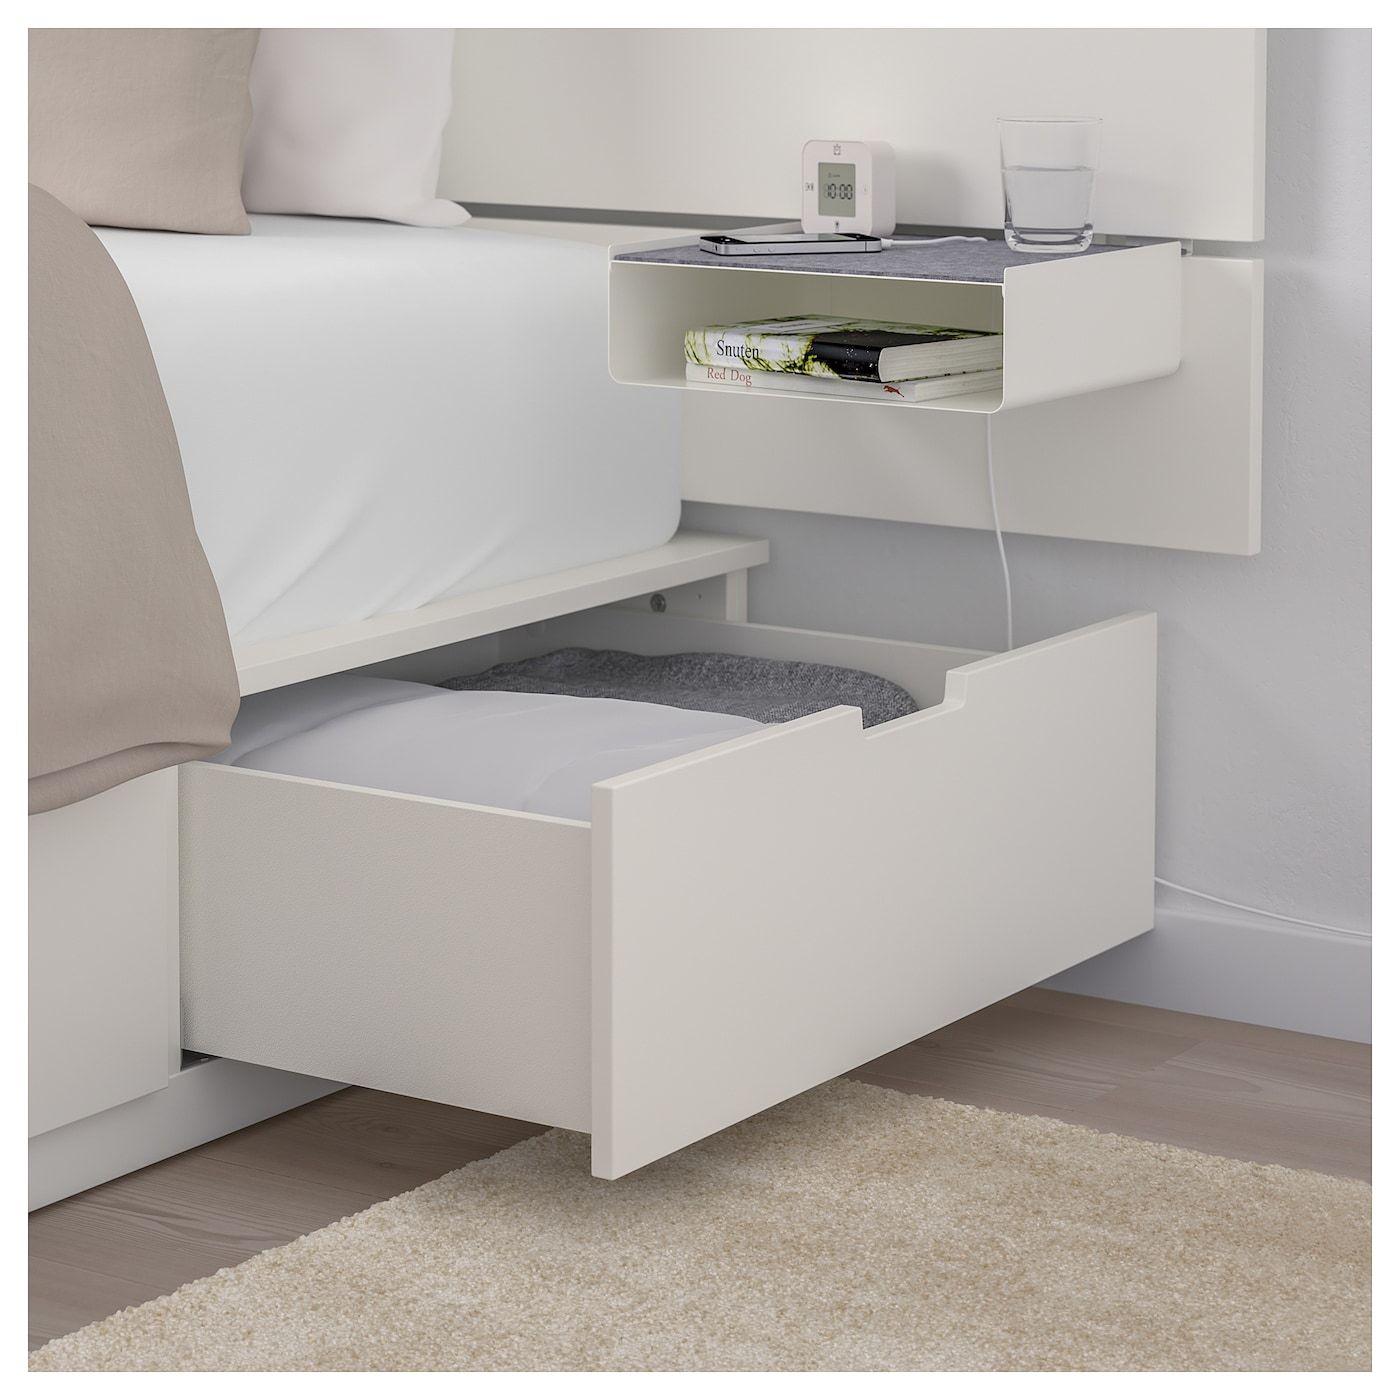 Nordli Bed With Headboard And Storage White Queen 160x200 Cm Lit Rangement Tete De Lit Avec Rangement Lit Blanc